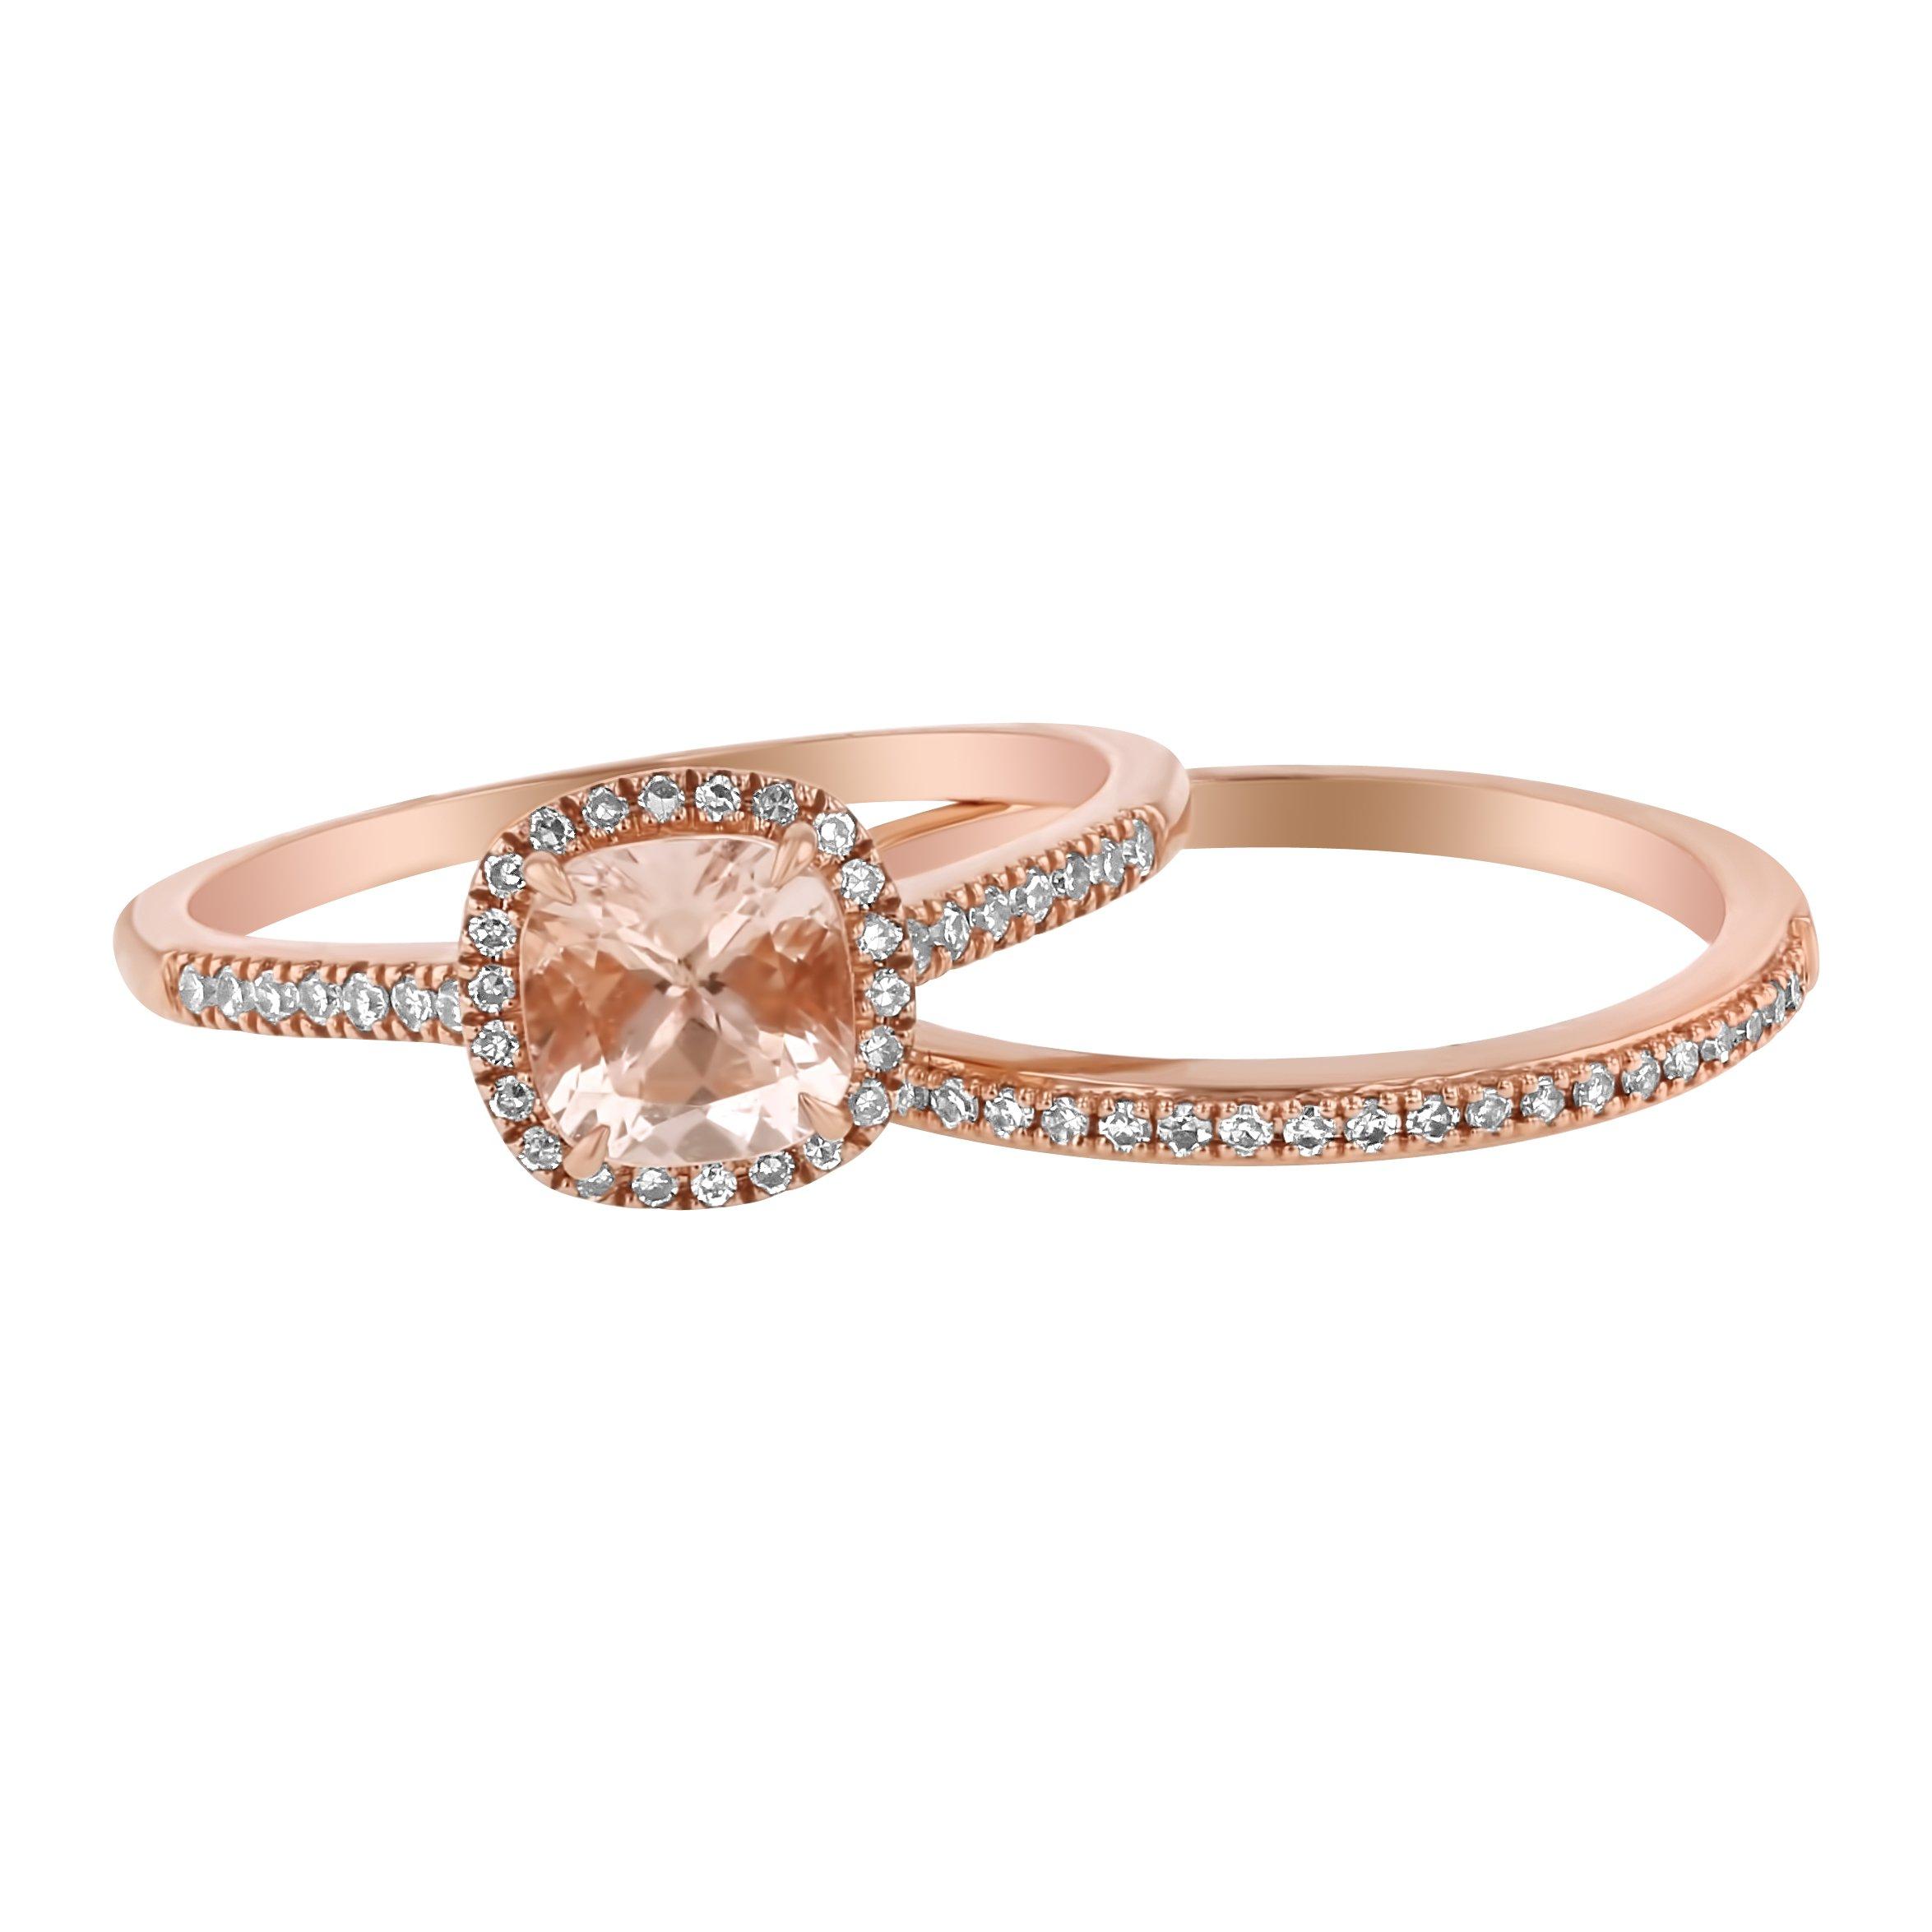 14k Rose Gold Cushion Morganite and Diamond Halo Wedding Set (1/4 cttw, H-I Color, I1 Clarity) Size 5